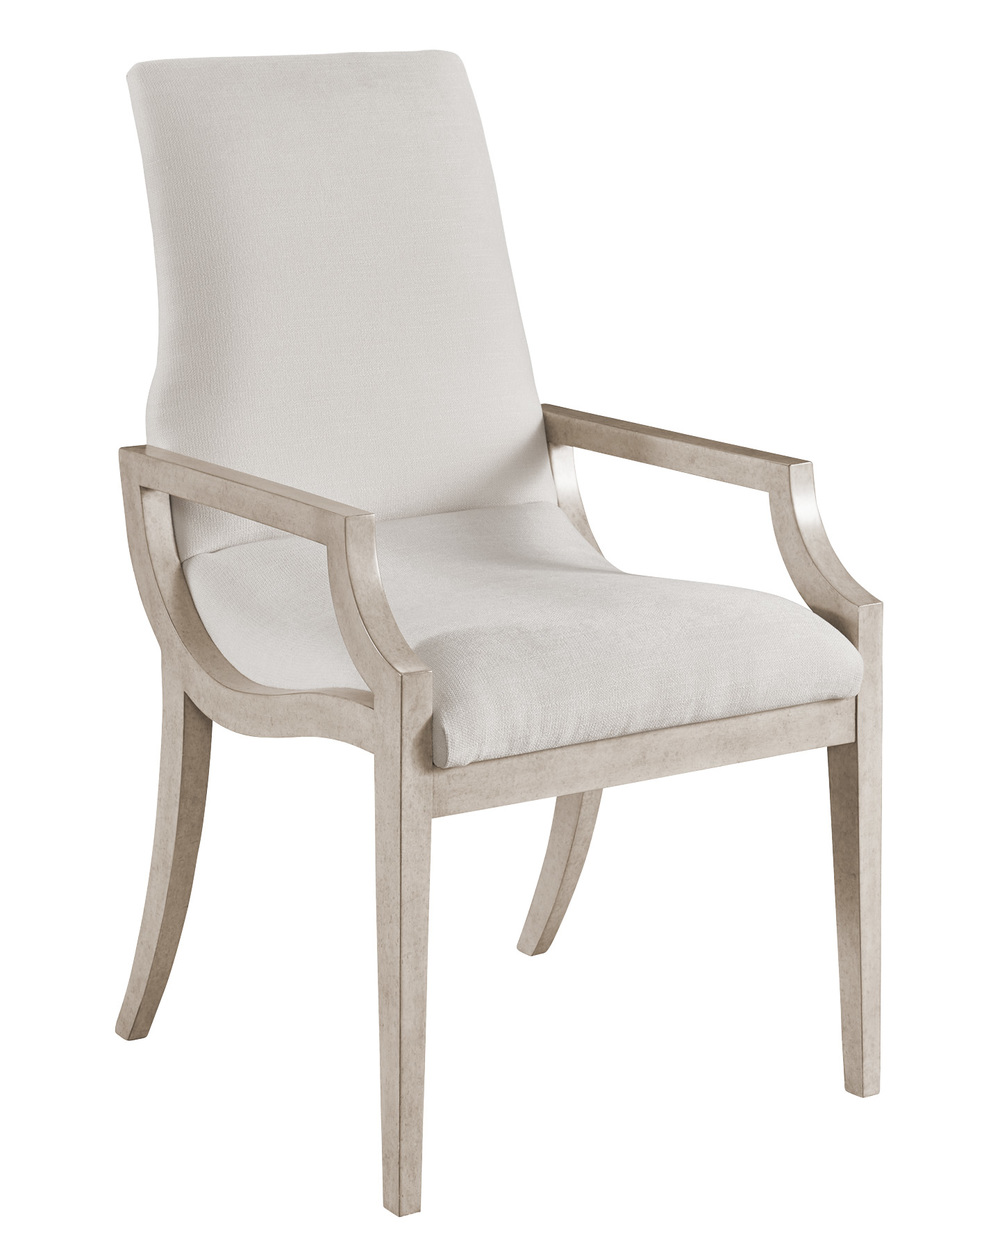 Marge Carson - Eclipse Arm Chair